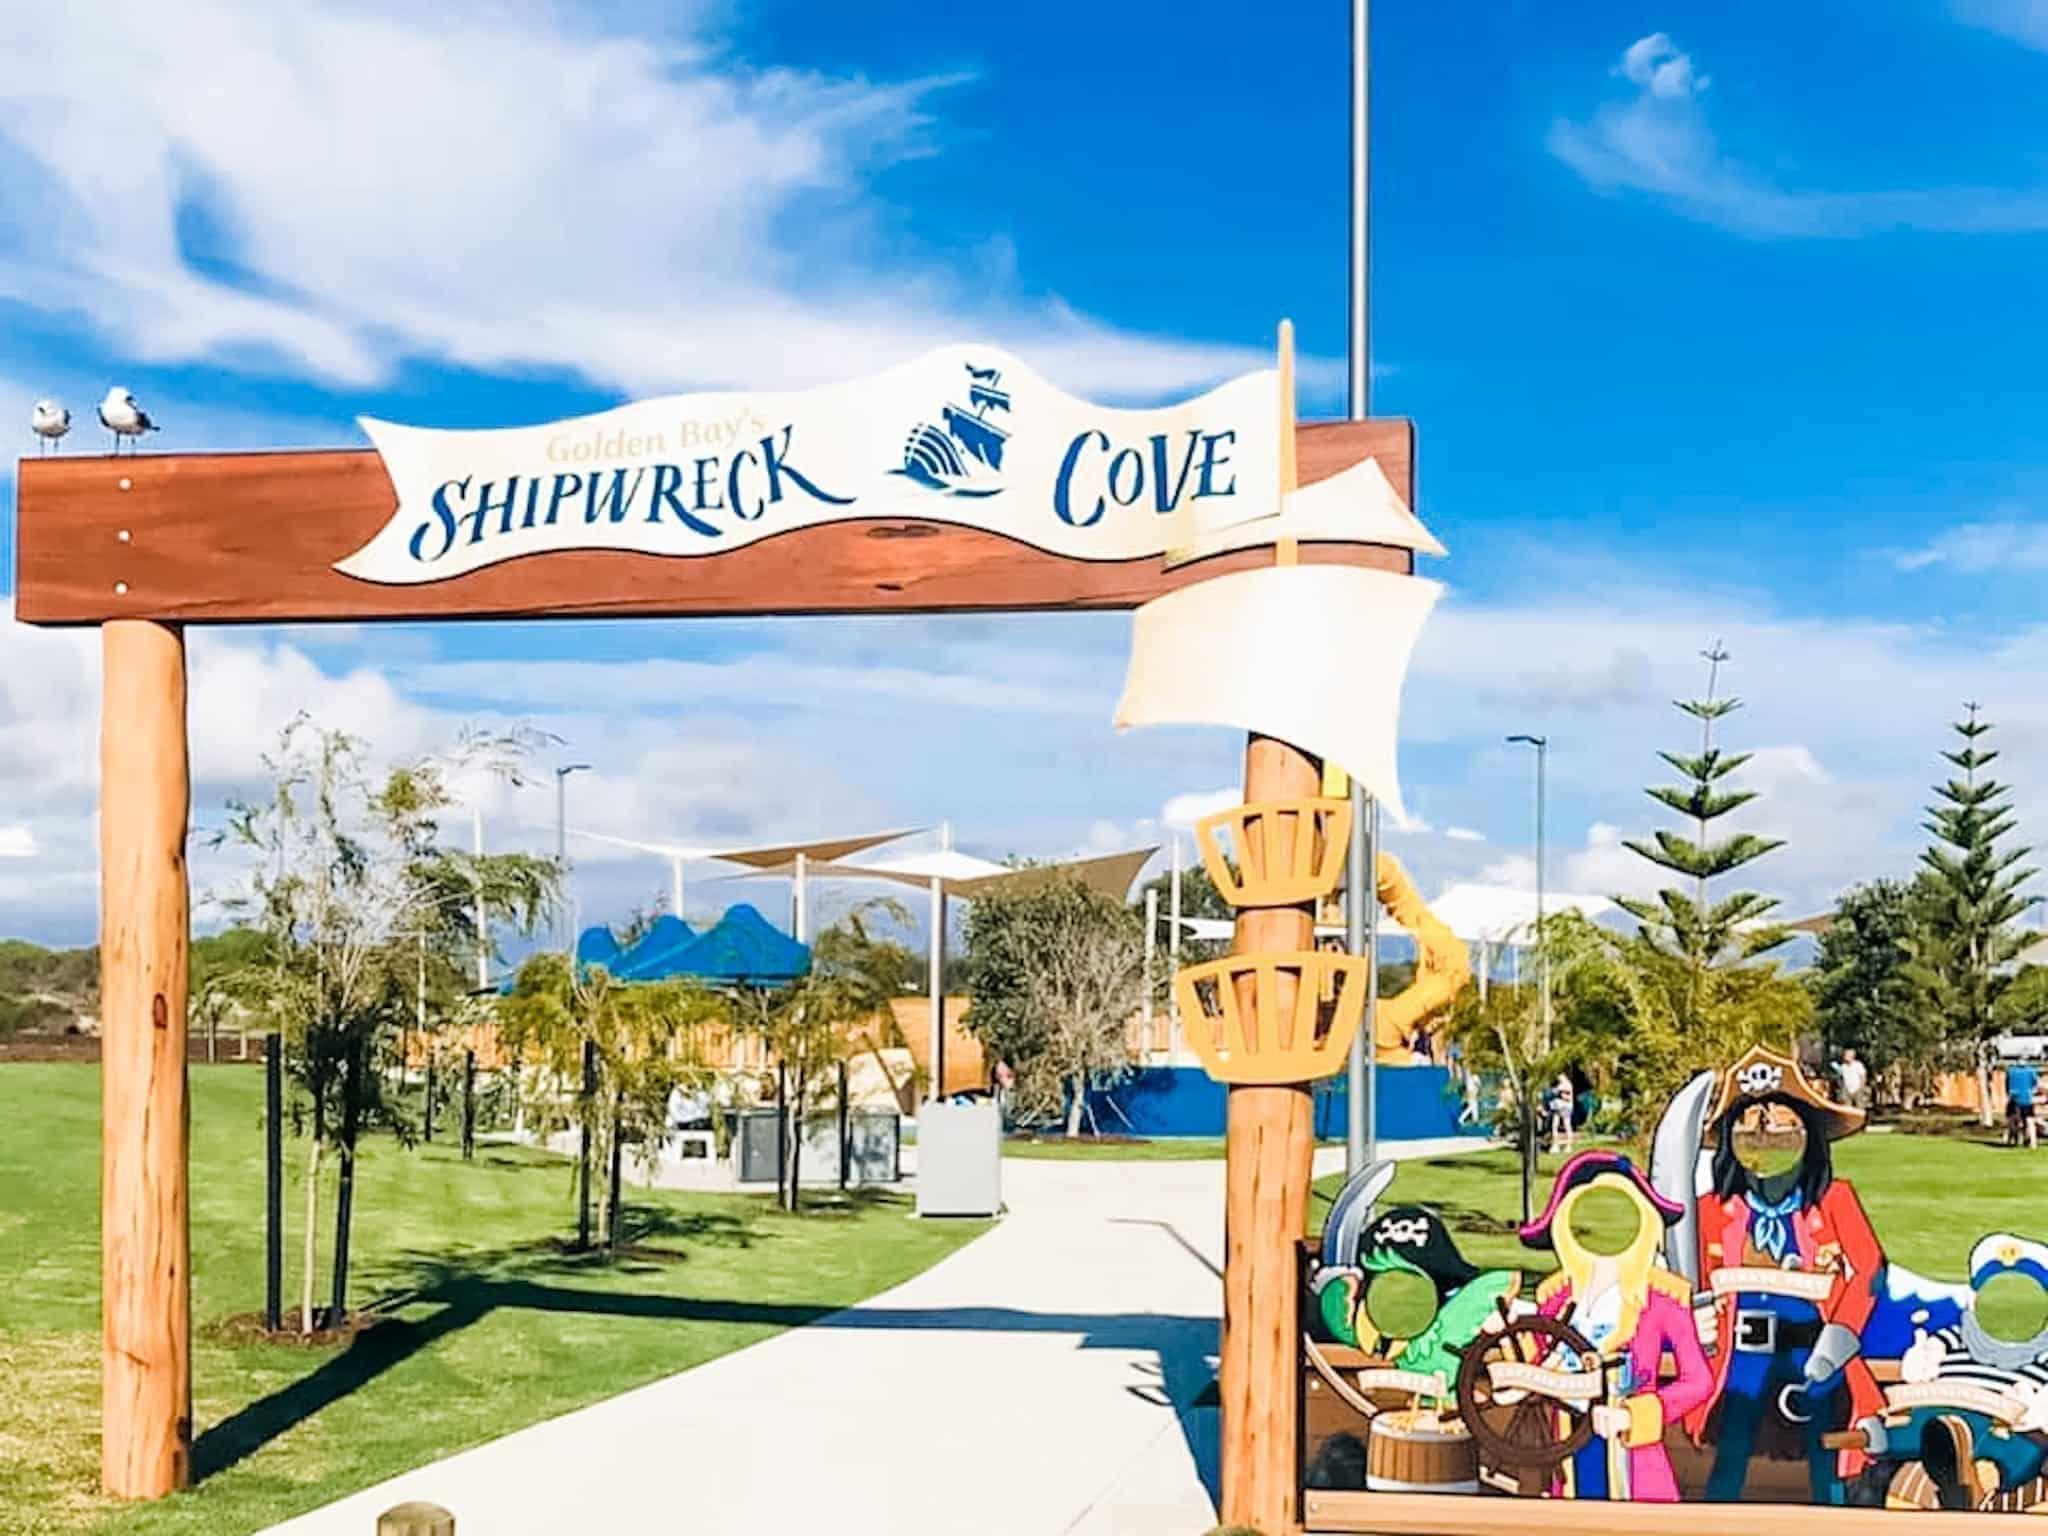 Shipwreck Cove, Golden Bay